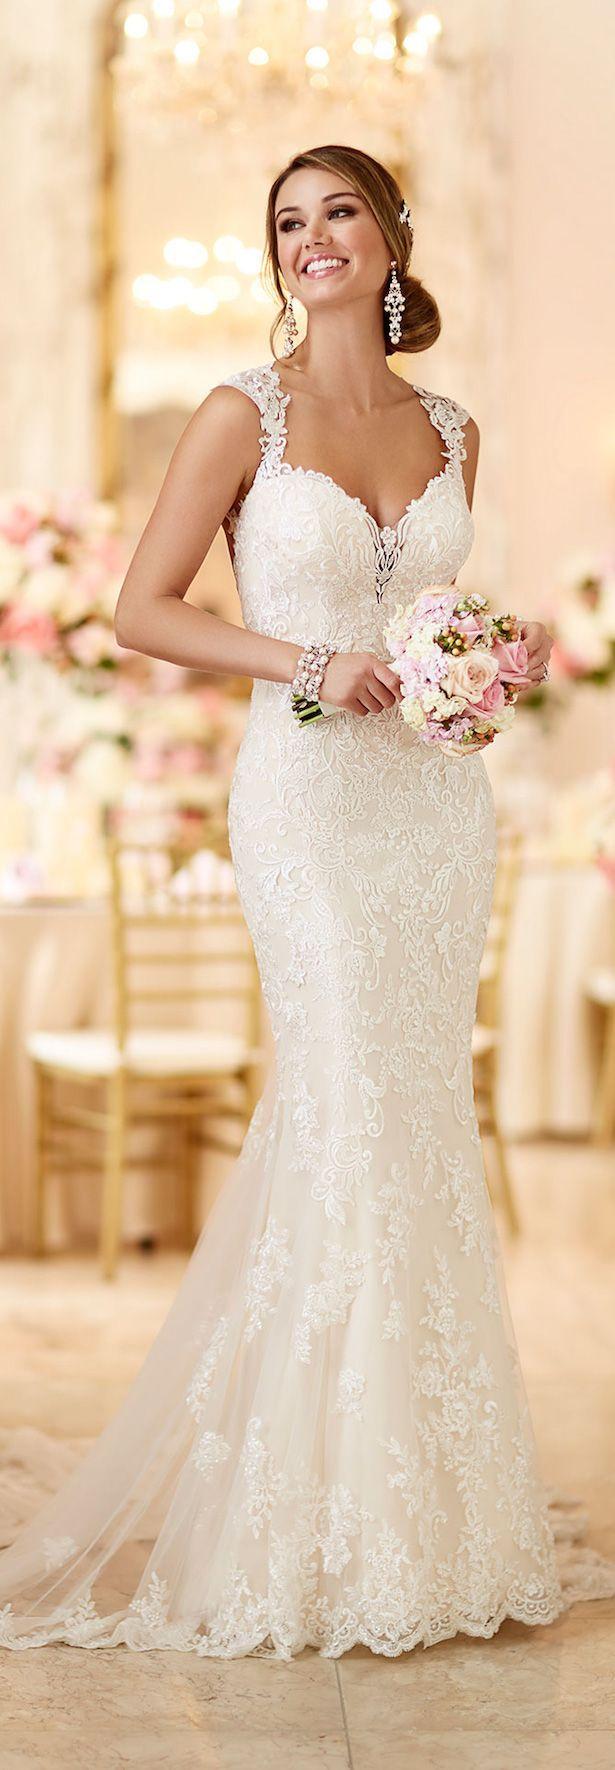 Best 20 2016 wedding dresses ideas on pinterest wedding for Dress for wedding guest abroad